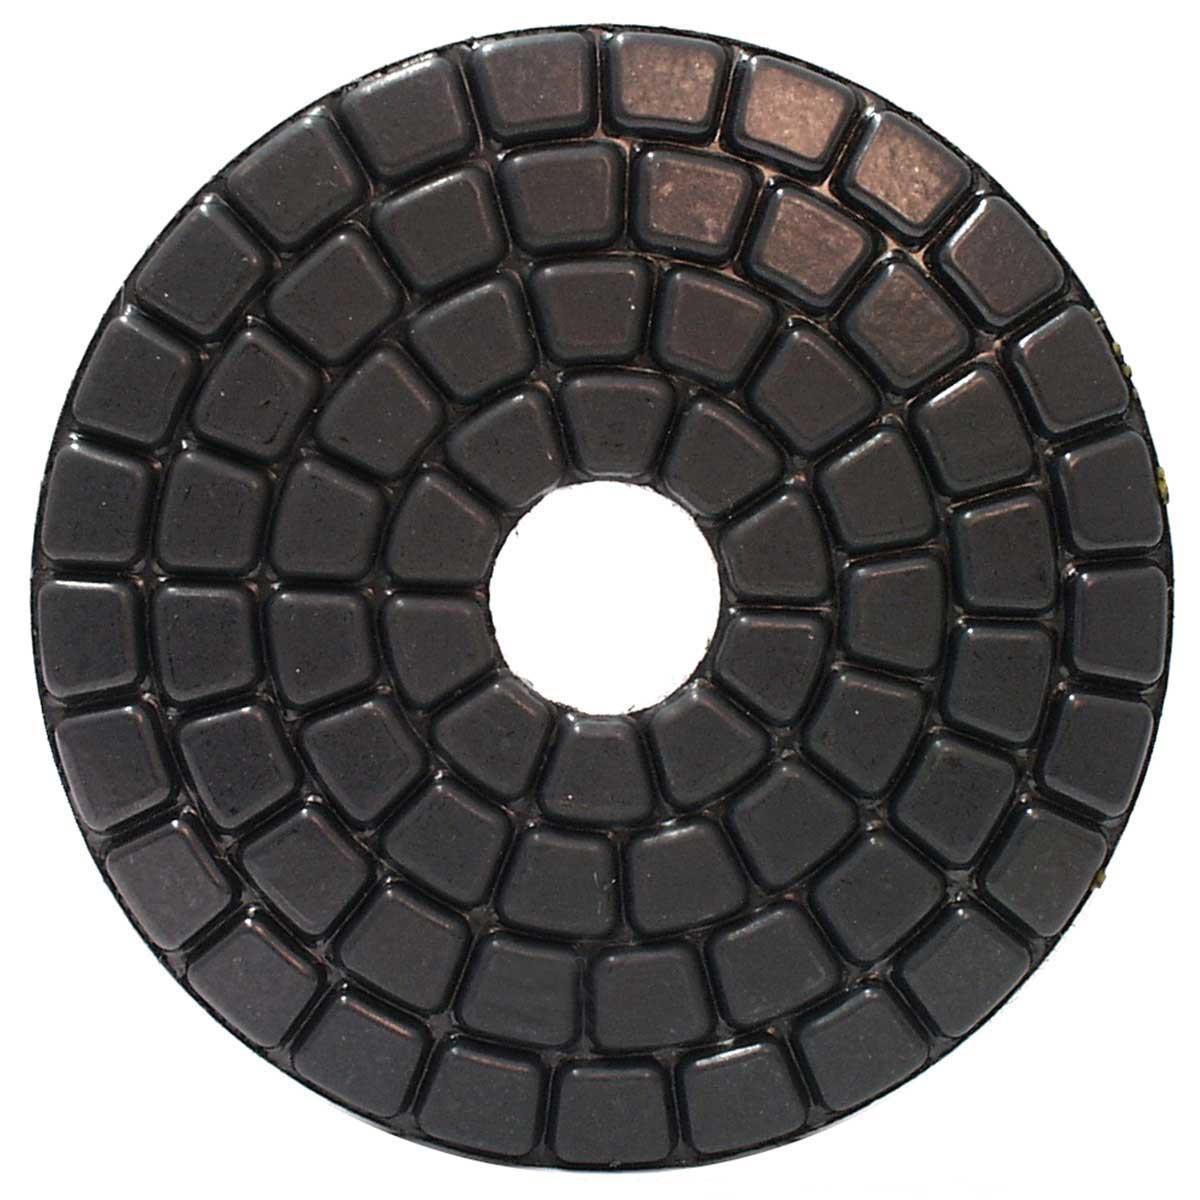 GP40300R 300 Grit Wet Stone Pads